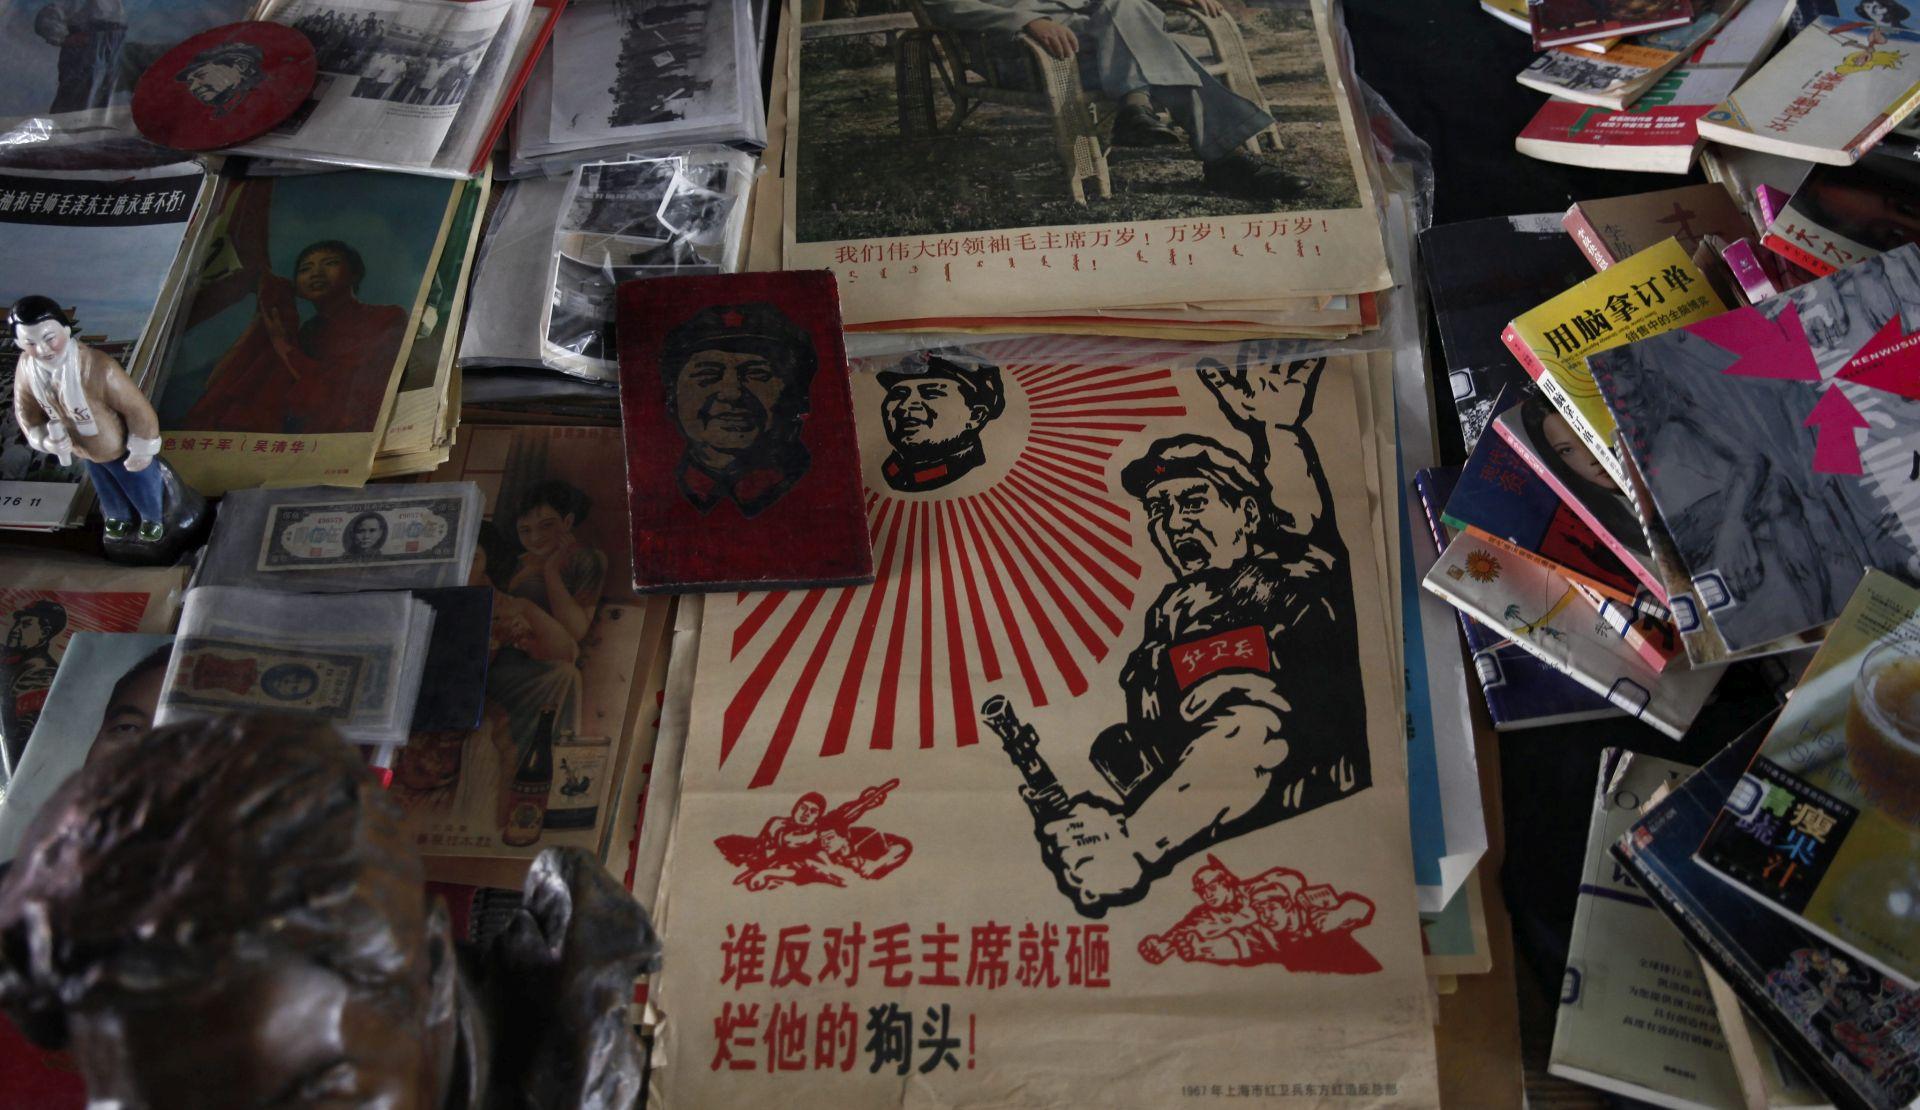 People's Daily: Kulturna revolucija ne smije se ponoviti